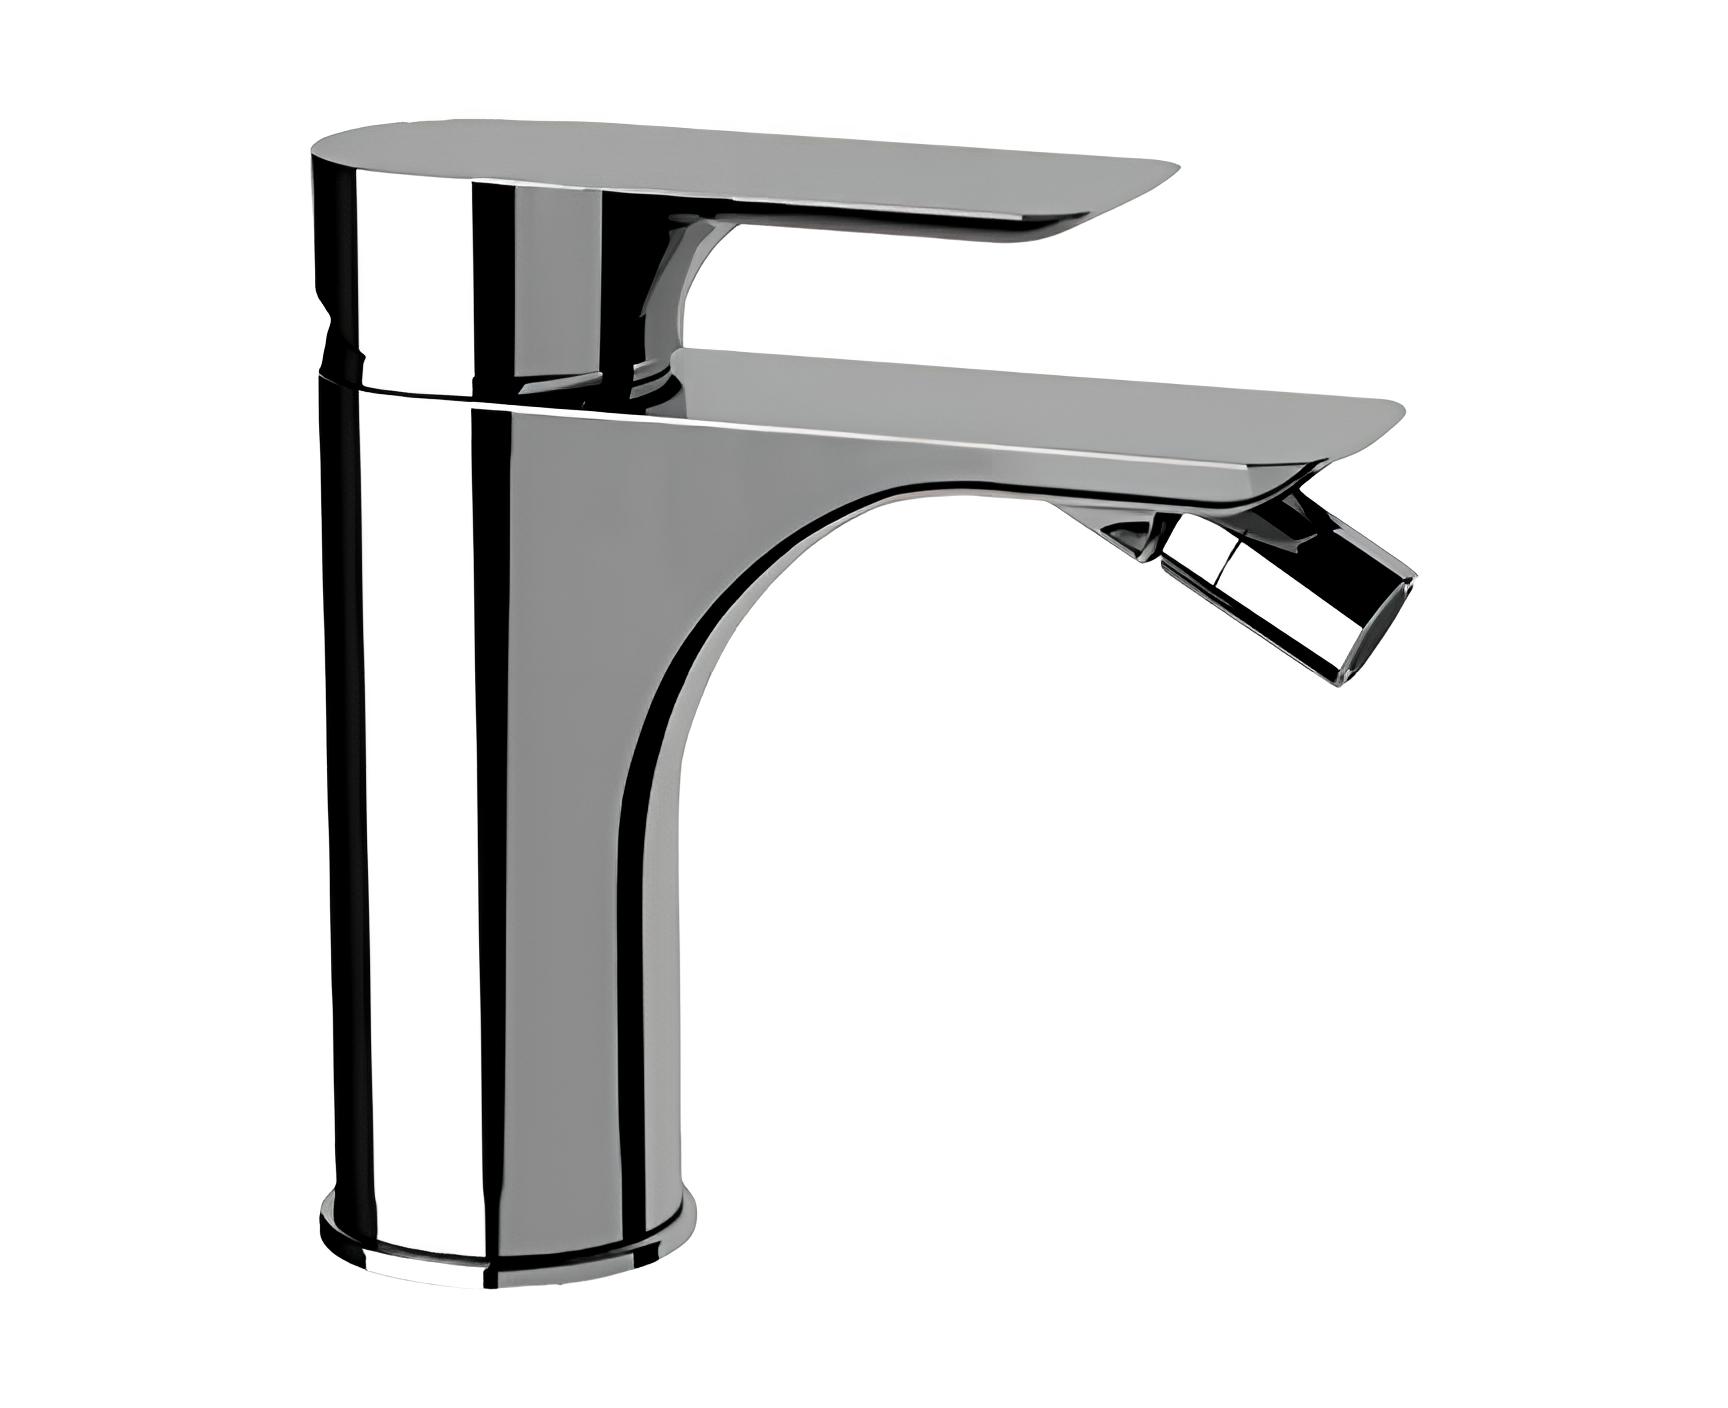 Bidetarmatur Infinity Ohne Abflusskappe Hebel Stehend Perfecto Design